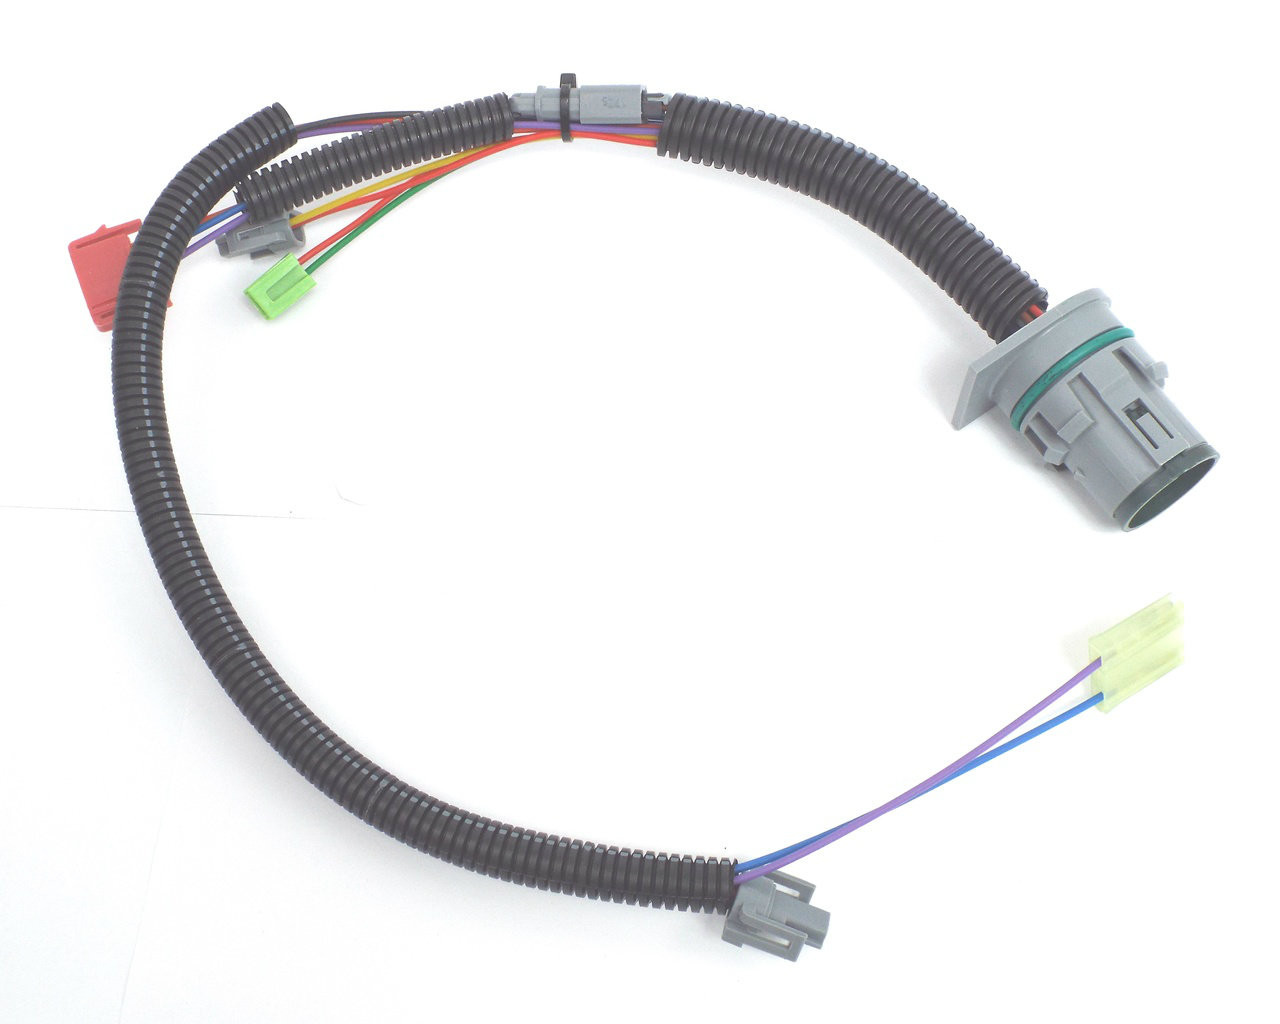 new 4l80e transmission hd internal valve body wiring harness 1991 2003 4l80e internal wiring harness diagram 4l80e internal wiring harness [ 1280 x 1024 Pixel ]